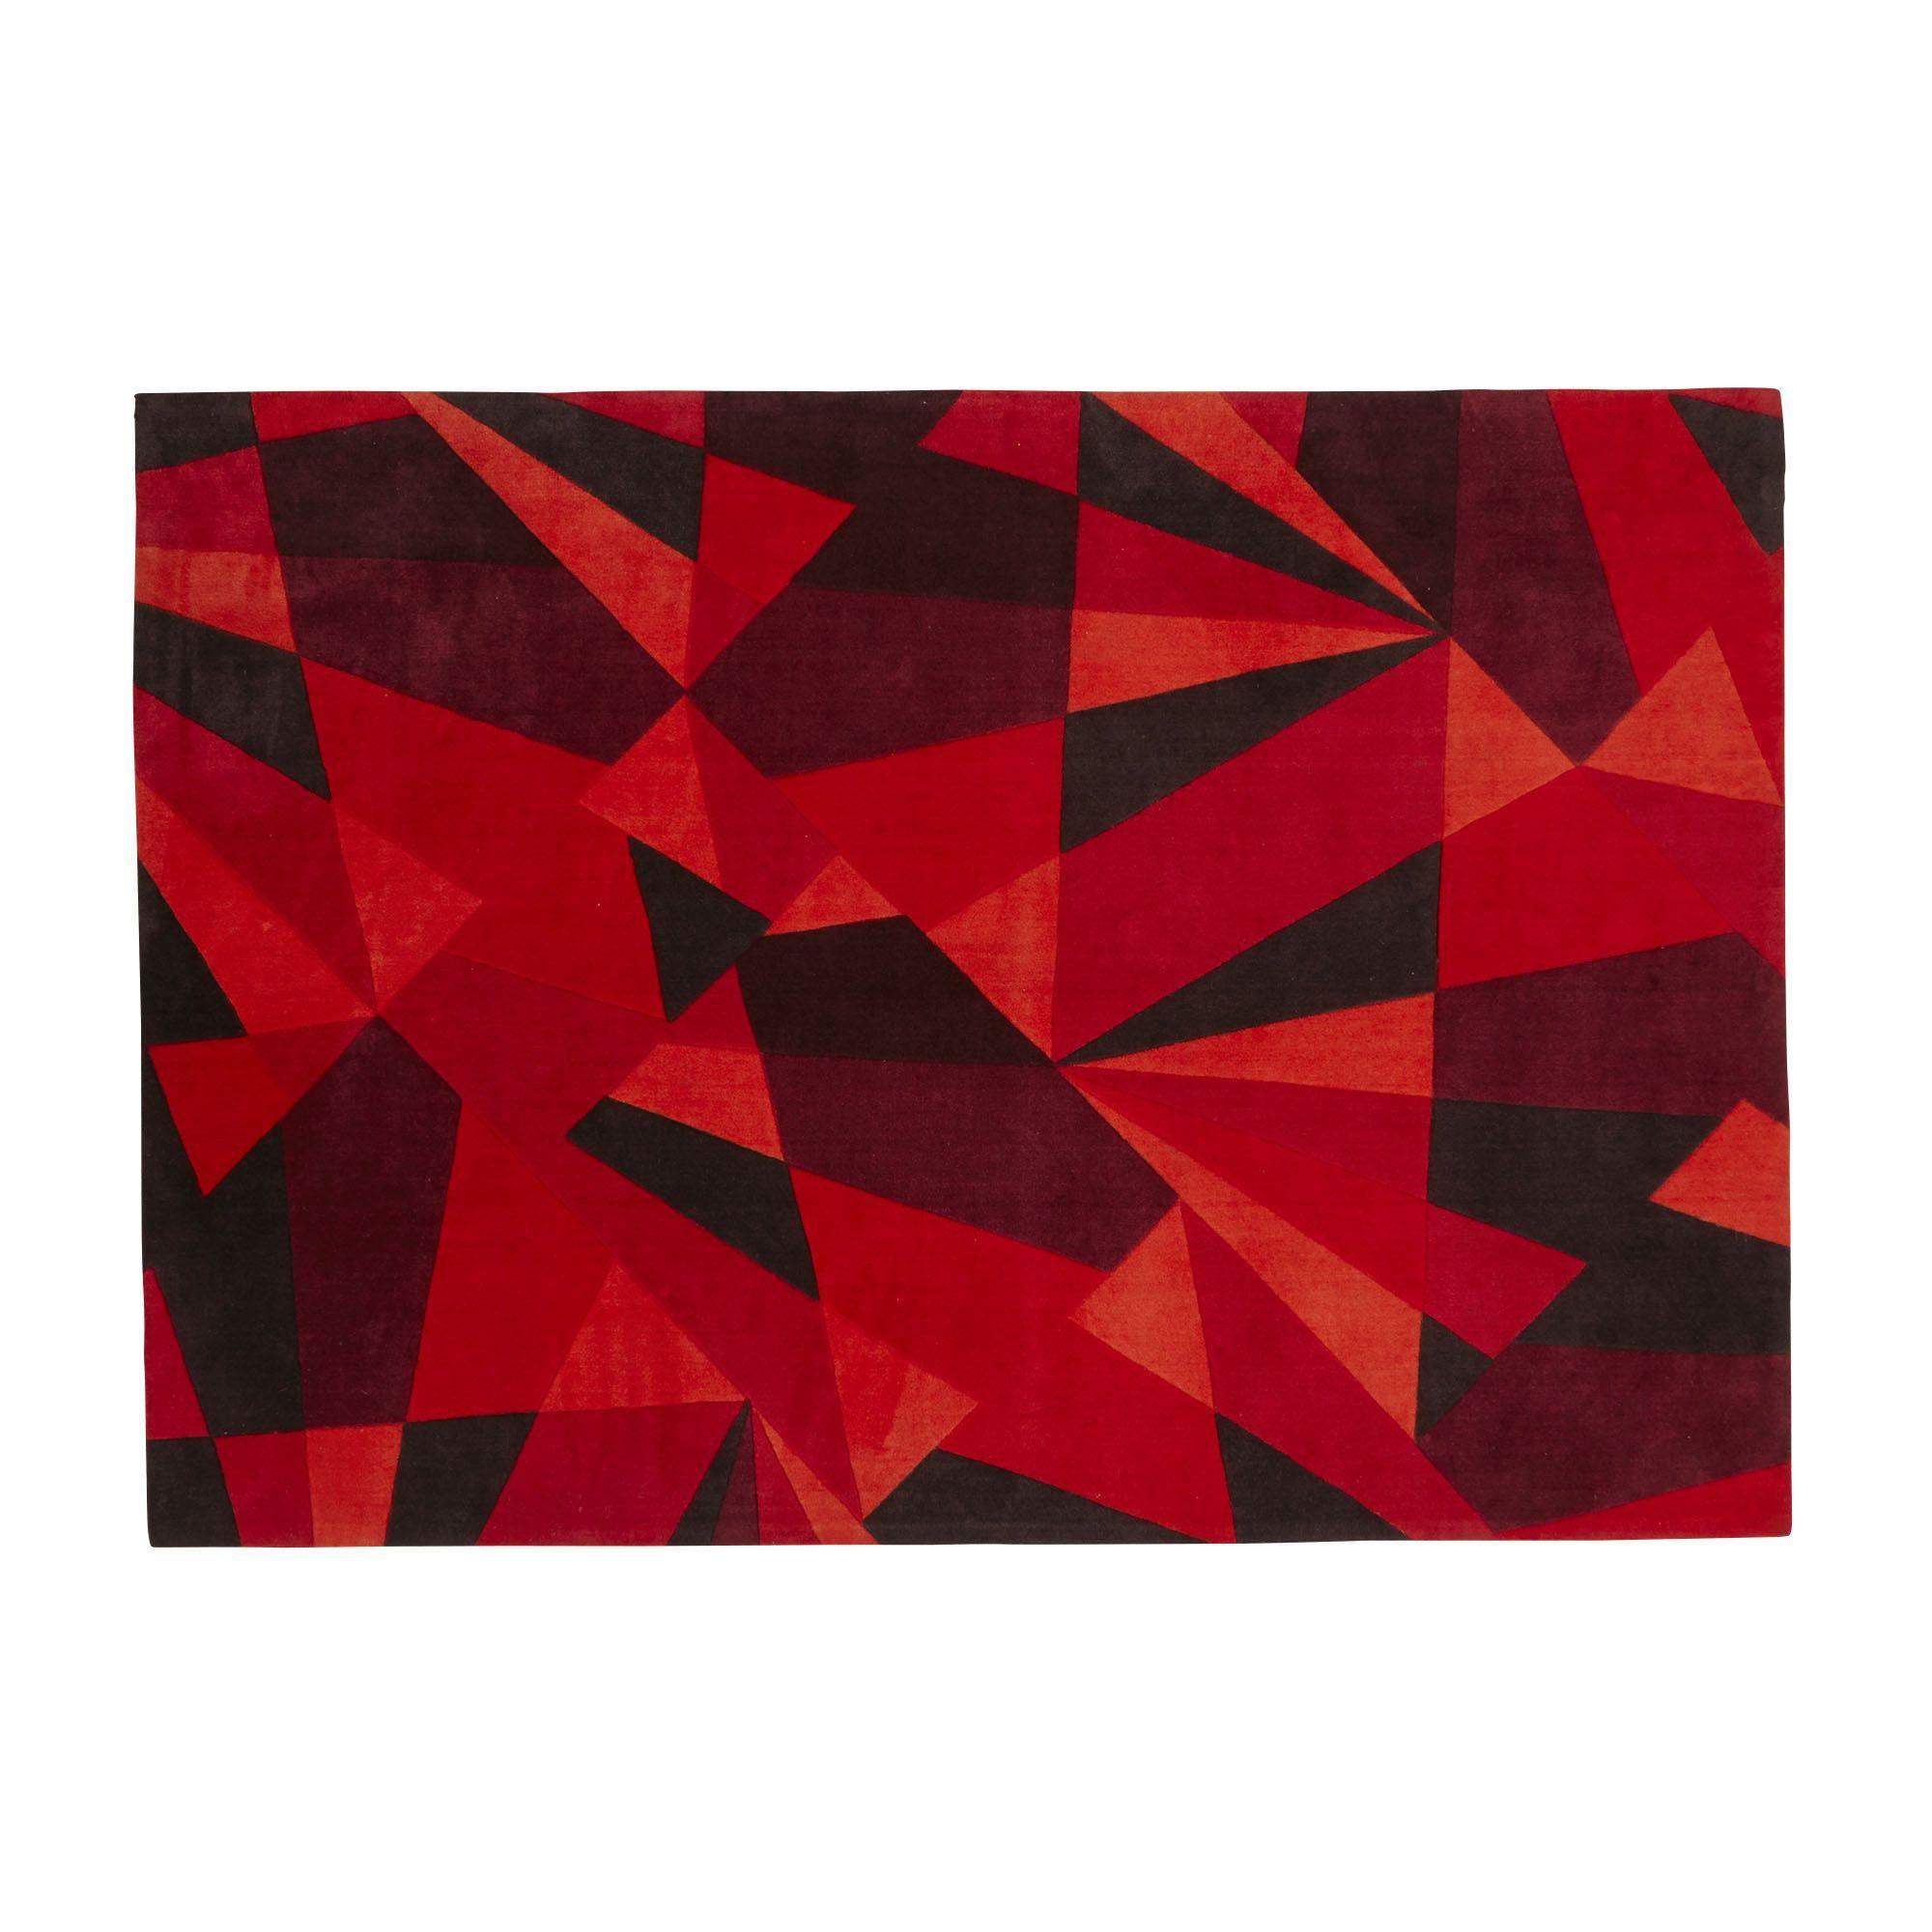 Tapis Rouge Toucher Velours 160x230cm Rouge Stendhal Les Tapis